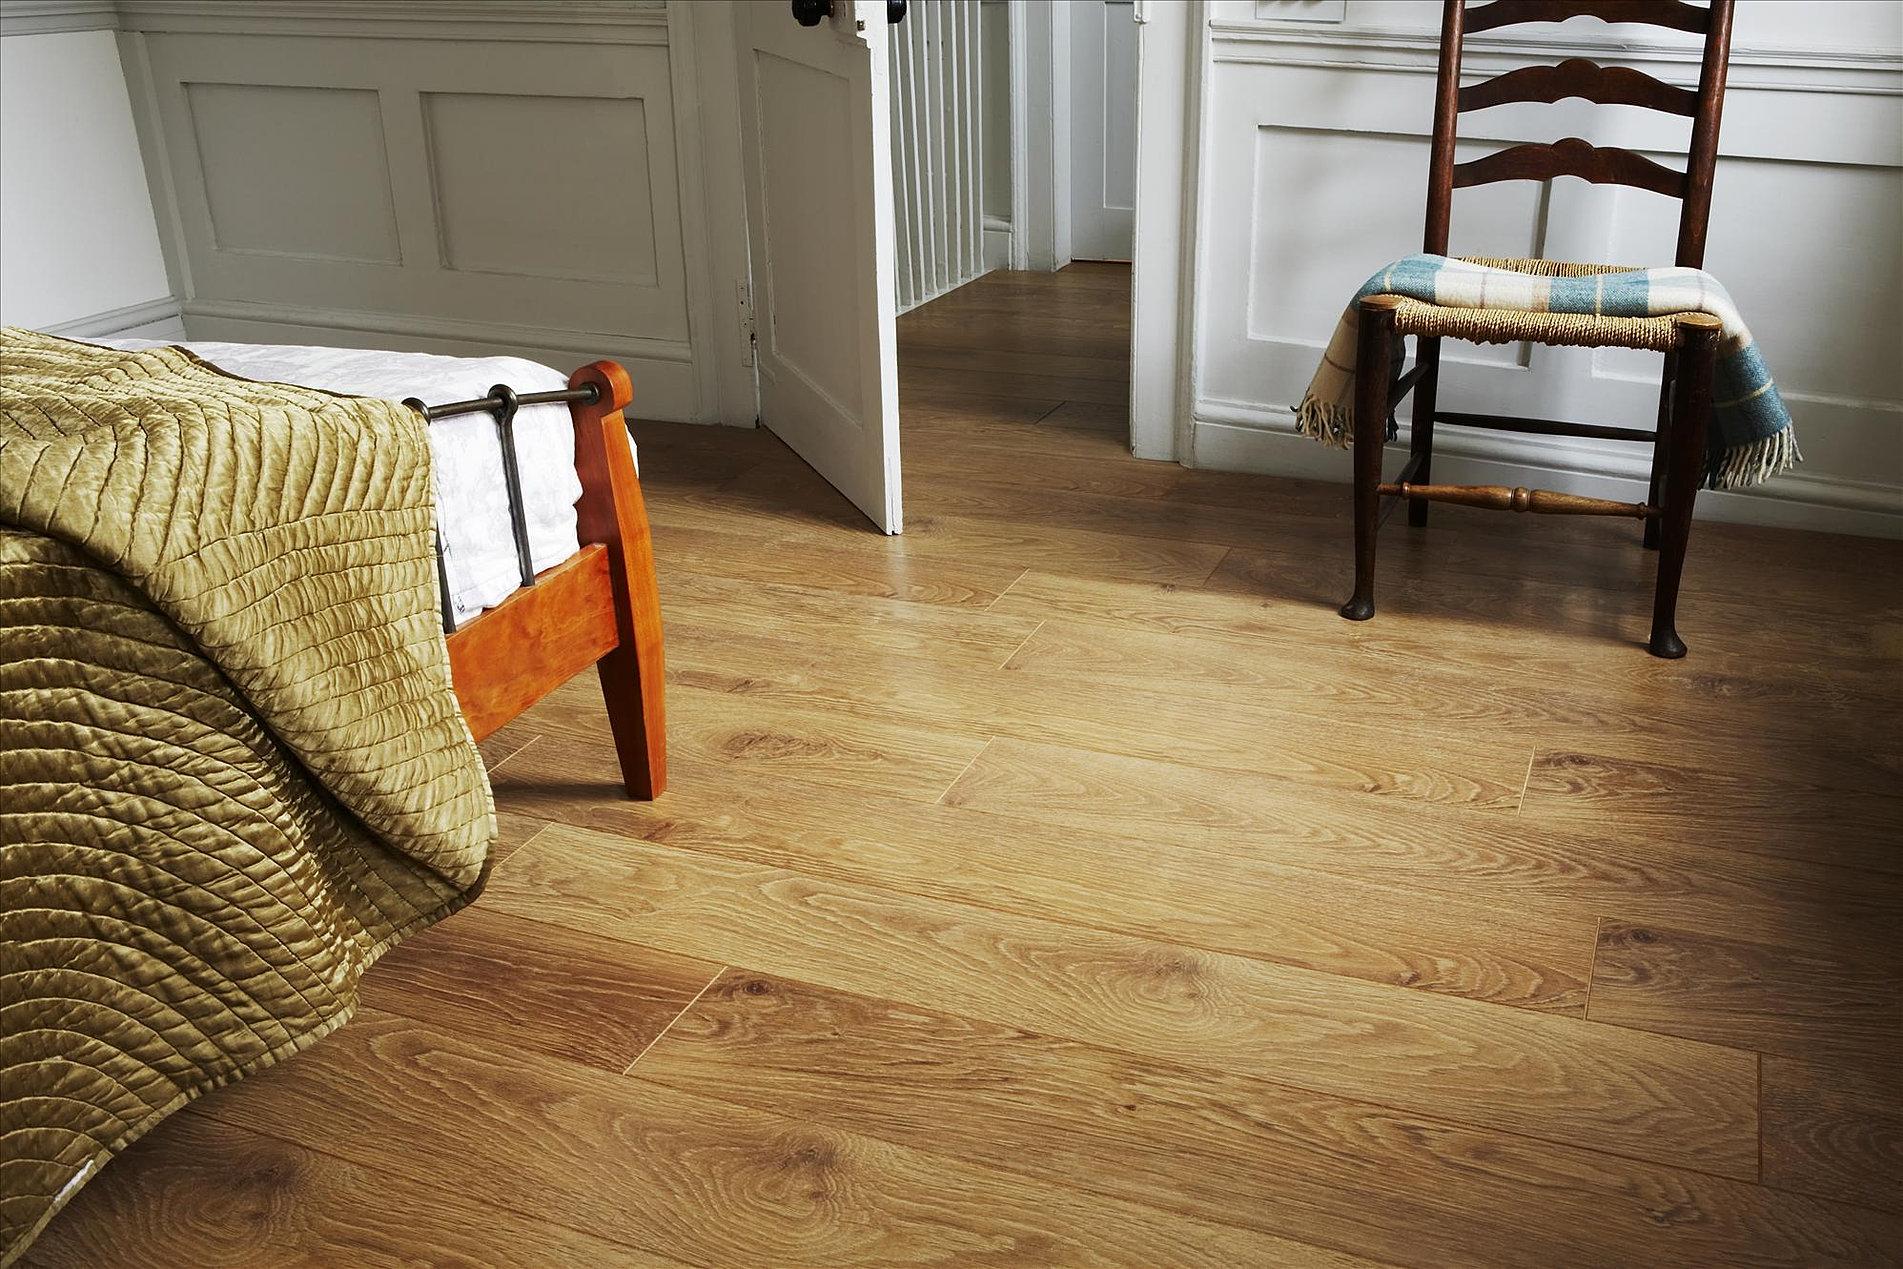 Calvetta brothers floor show 216 662 5550 laminate flooring 945 doublecrazyfo Image collections